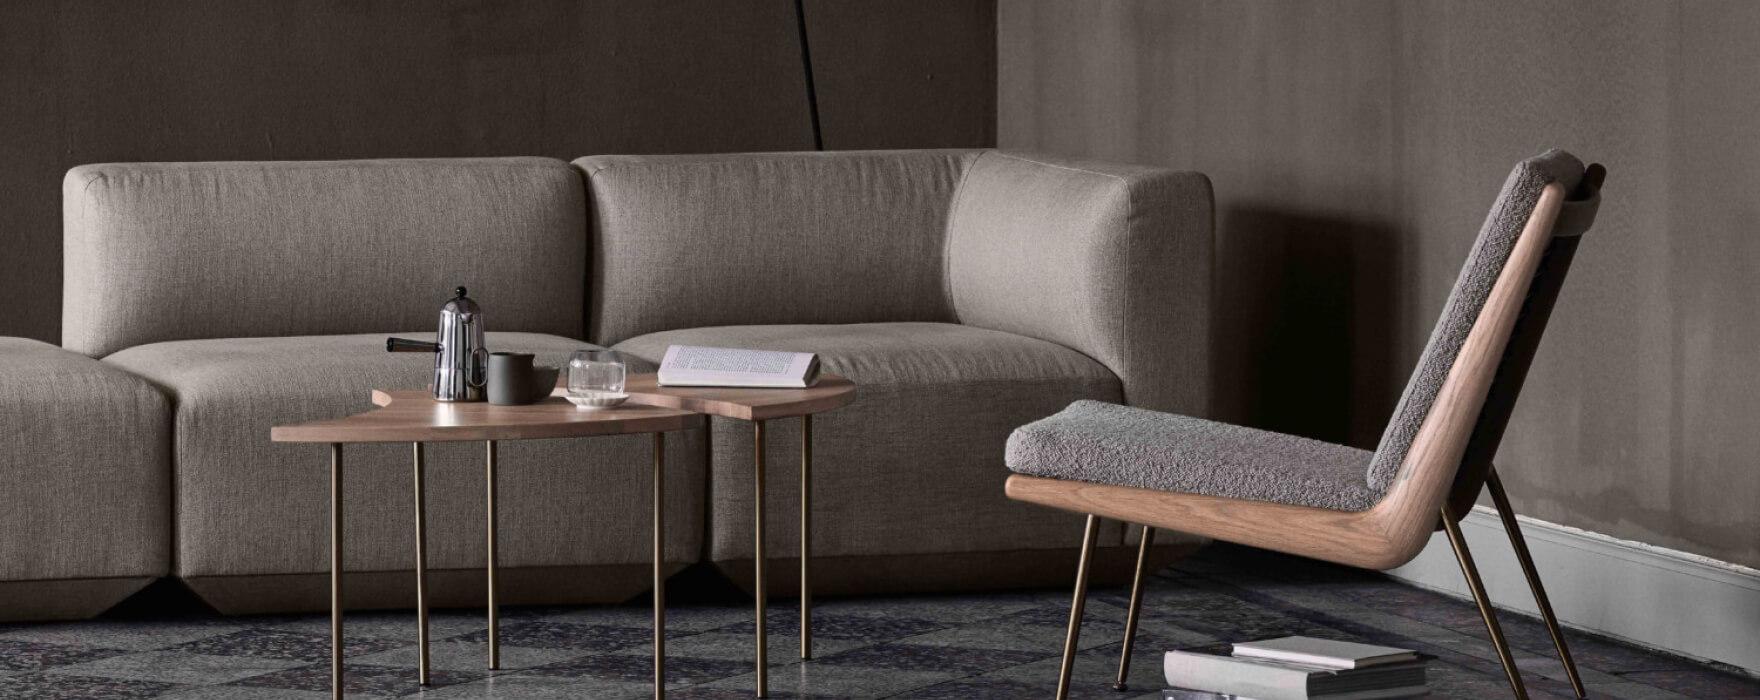 Nordic design furniture and lighting